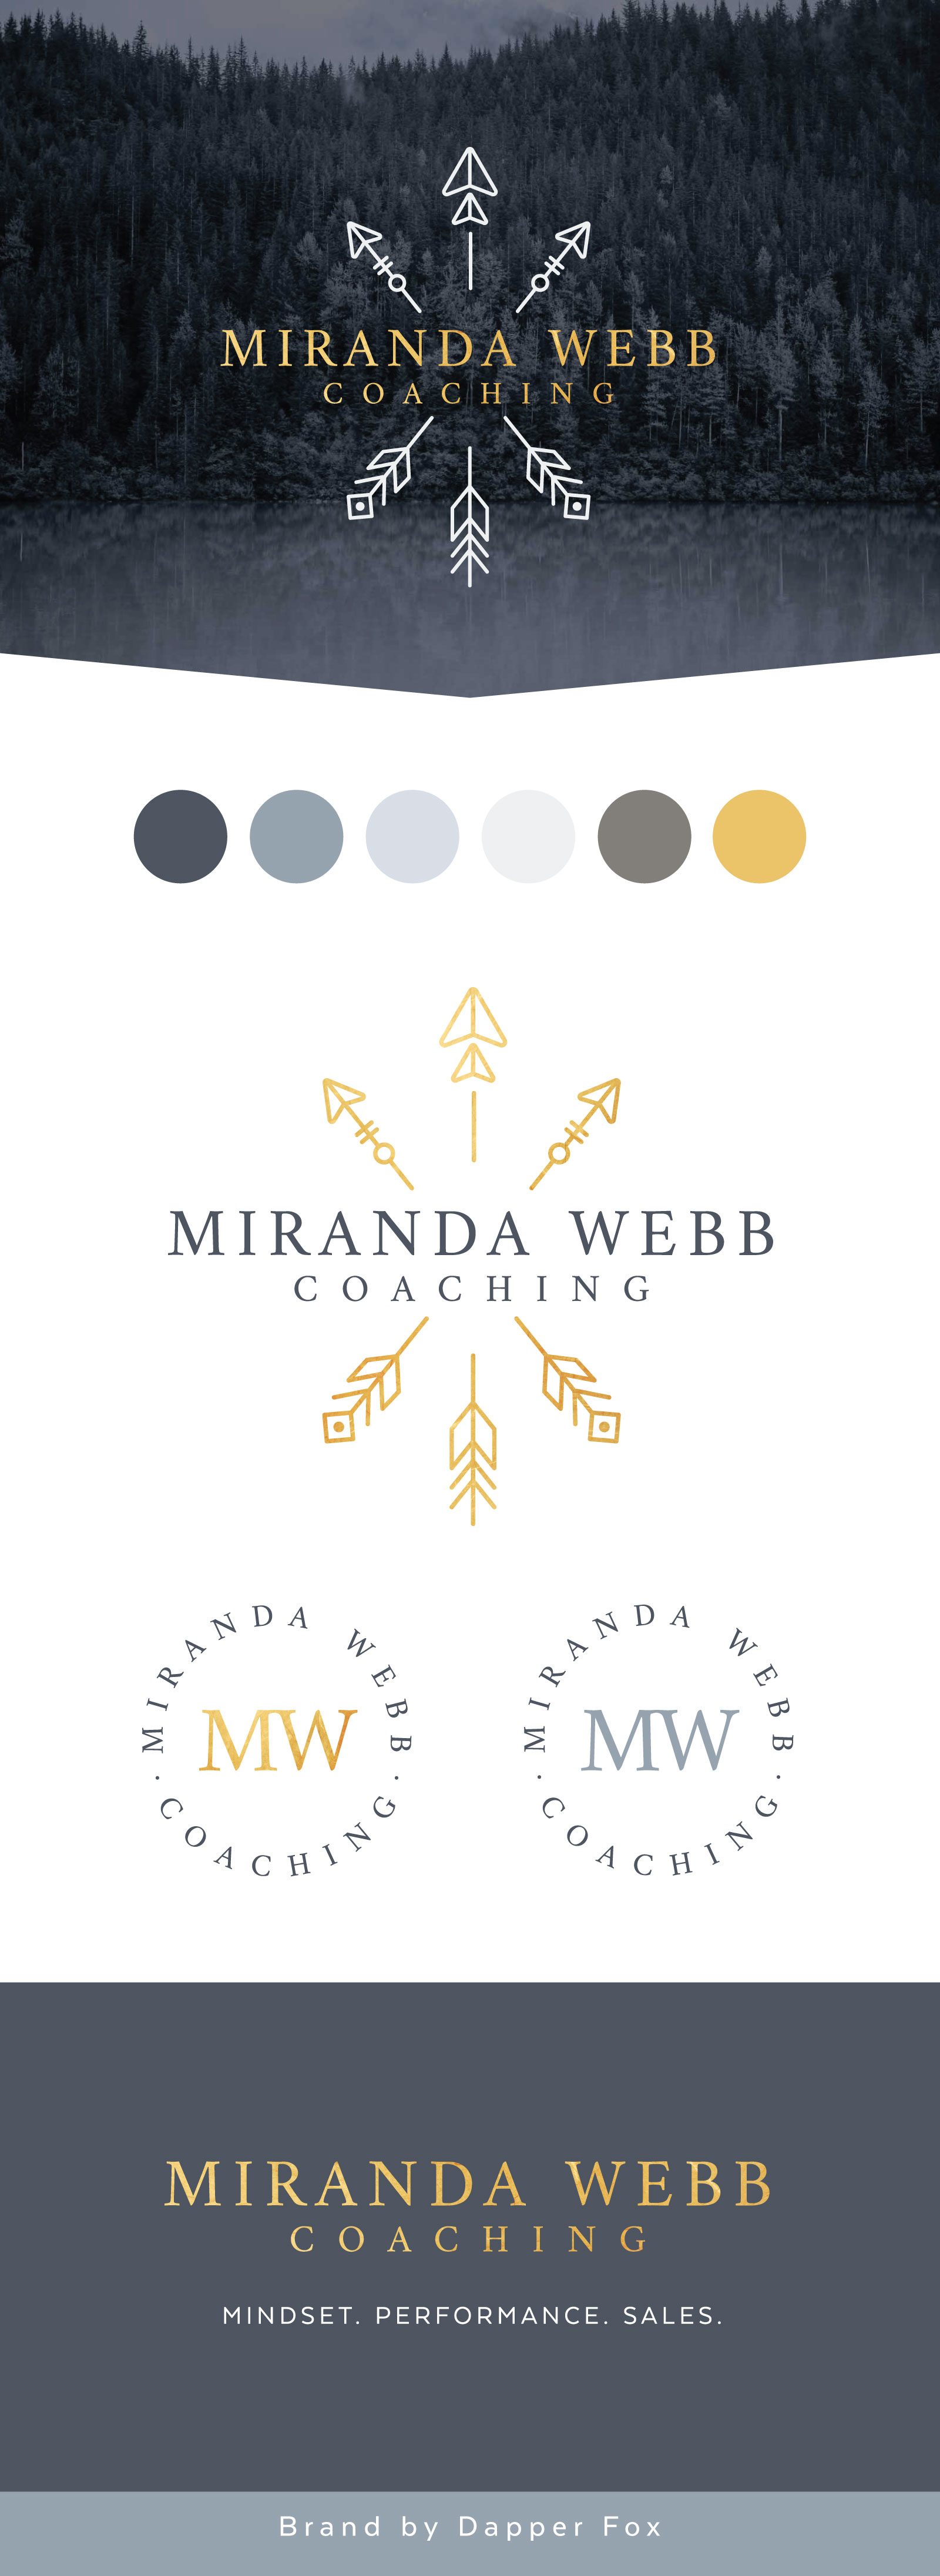 Miranda Webb Coaching Branding Website Design Dapper Fox Design Branding Website Design